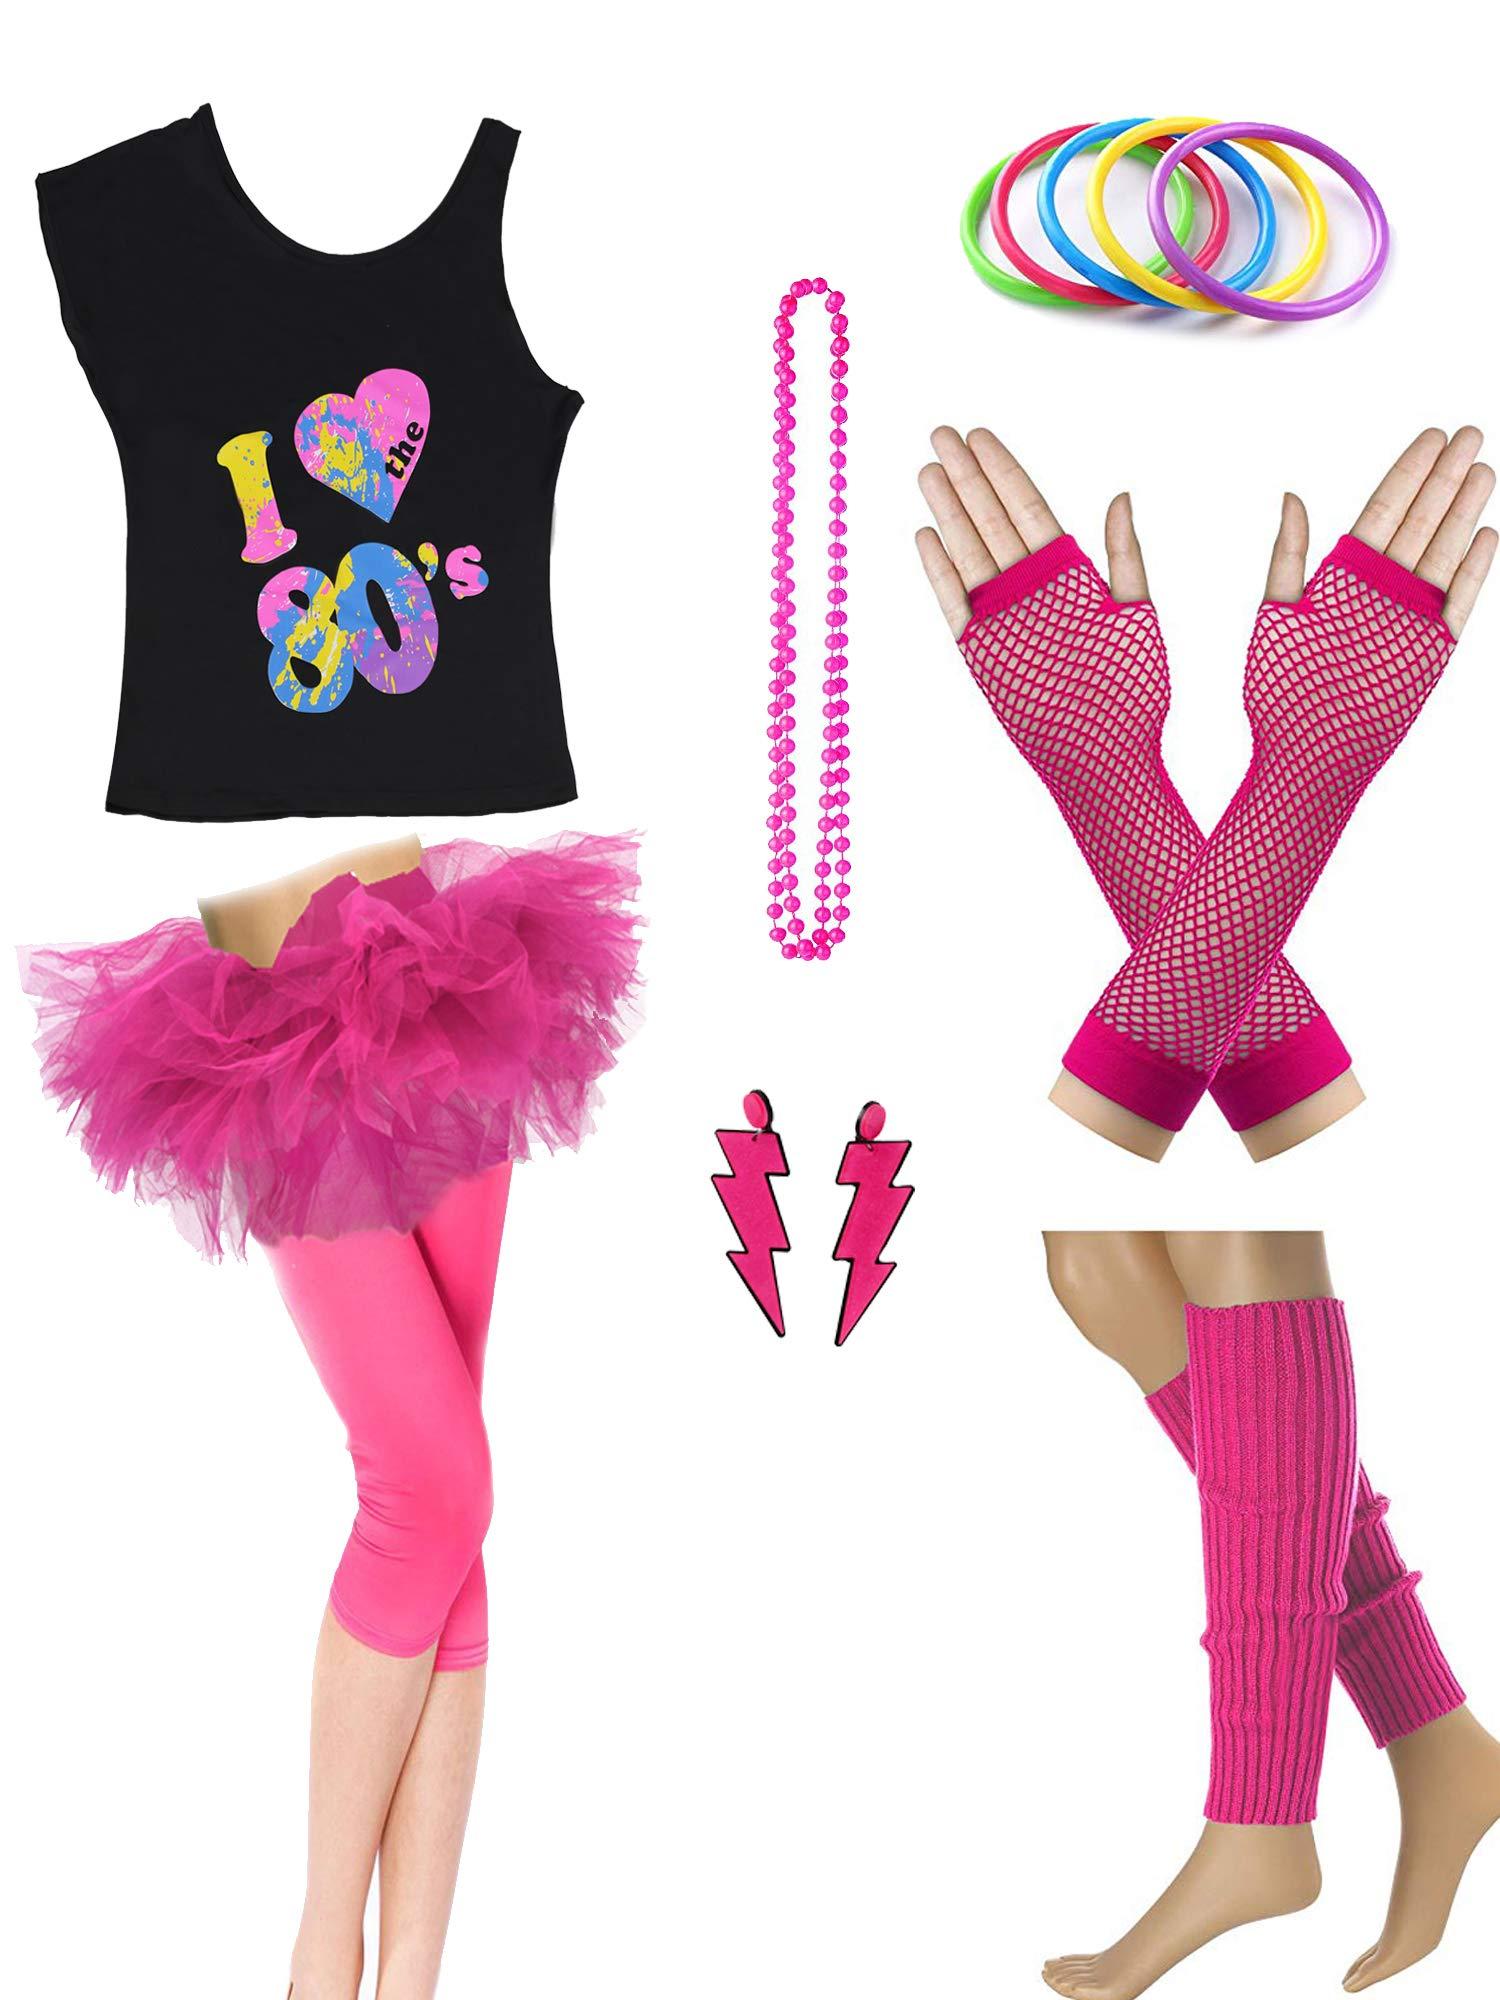 Dorigan Womens 80s Neon Rainbow T-Shirt Fancy Outfit Dress Costume Accessories (XL, Hot Pink)